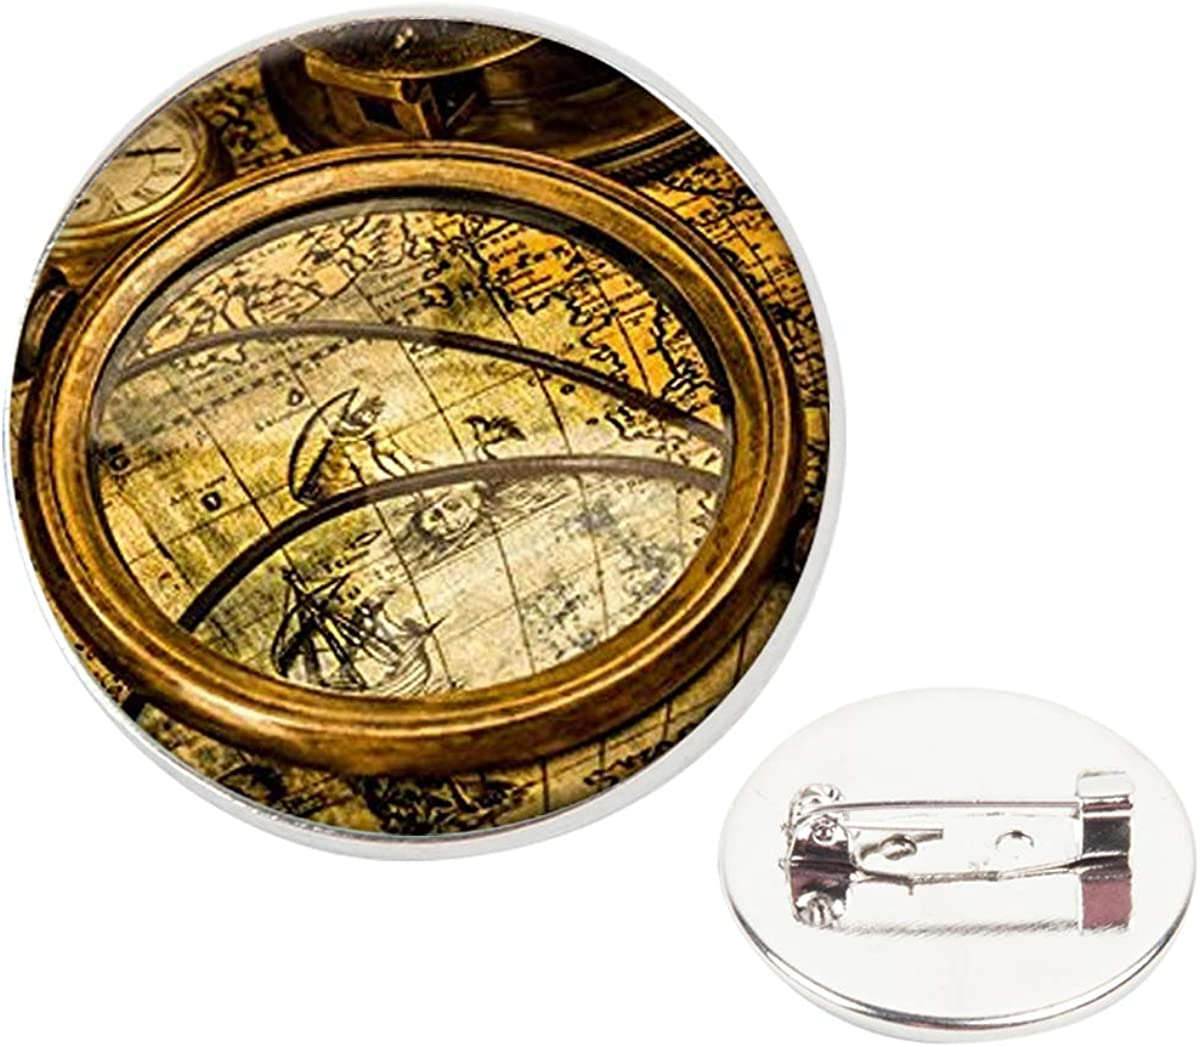 Pinback Buttons Badges Pins Ancient Map Lapel Pin Brooch Clip Trendy Accessory Jacket T-Shirt Bag Hat Shoe